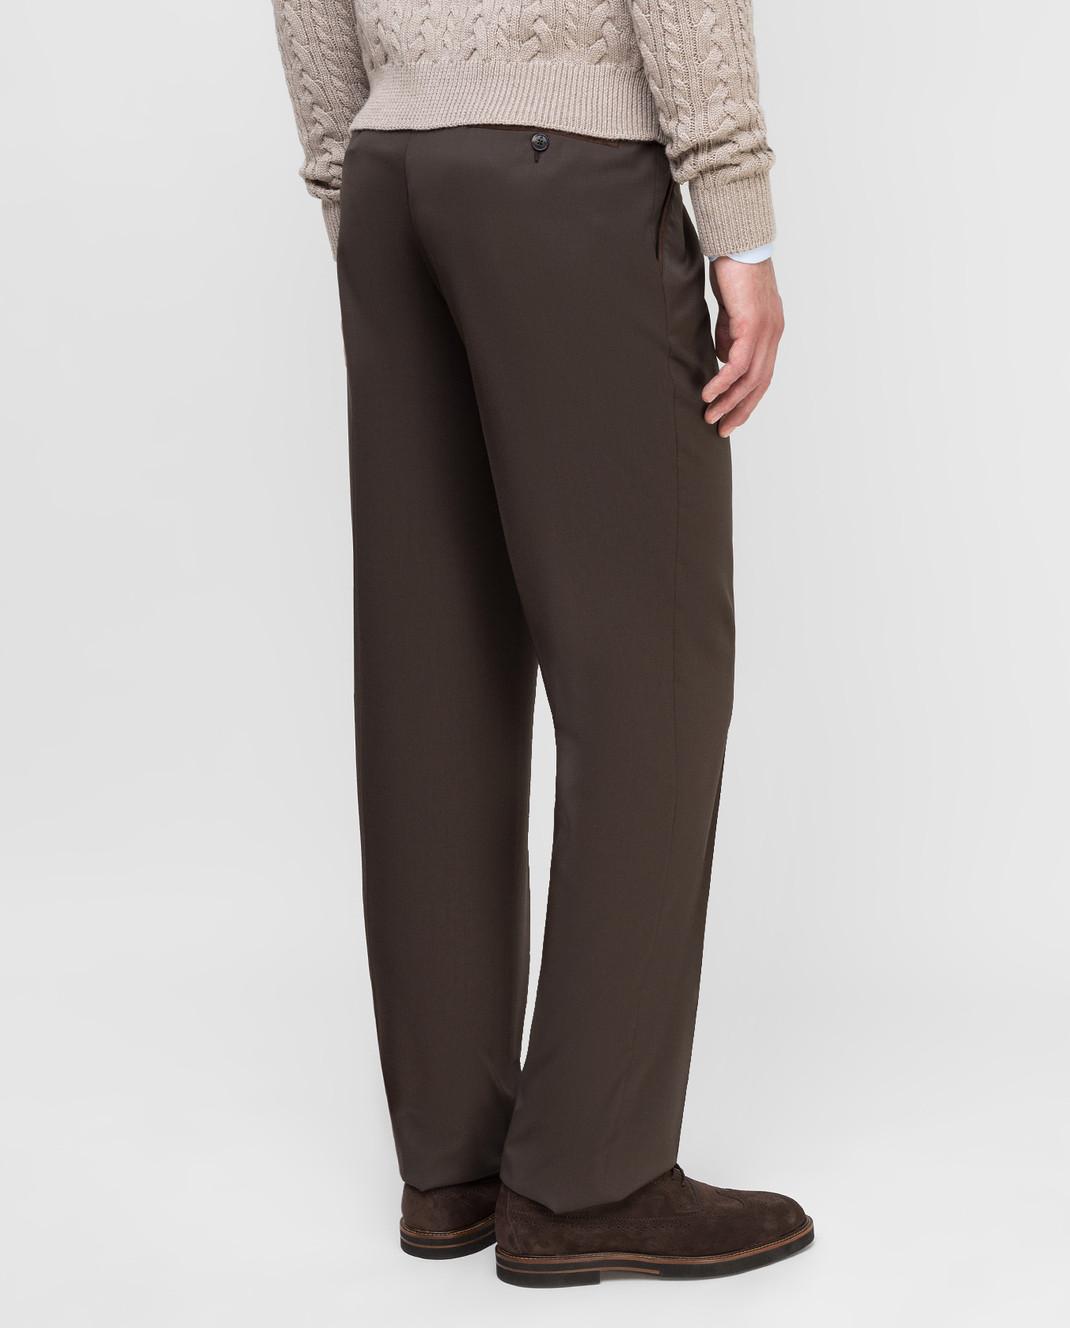 Castello d'Oro Темно-коричневые брюки из шерсти изображение 4